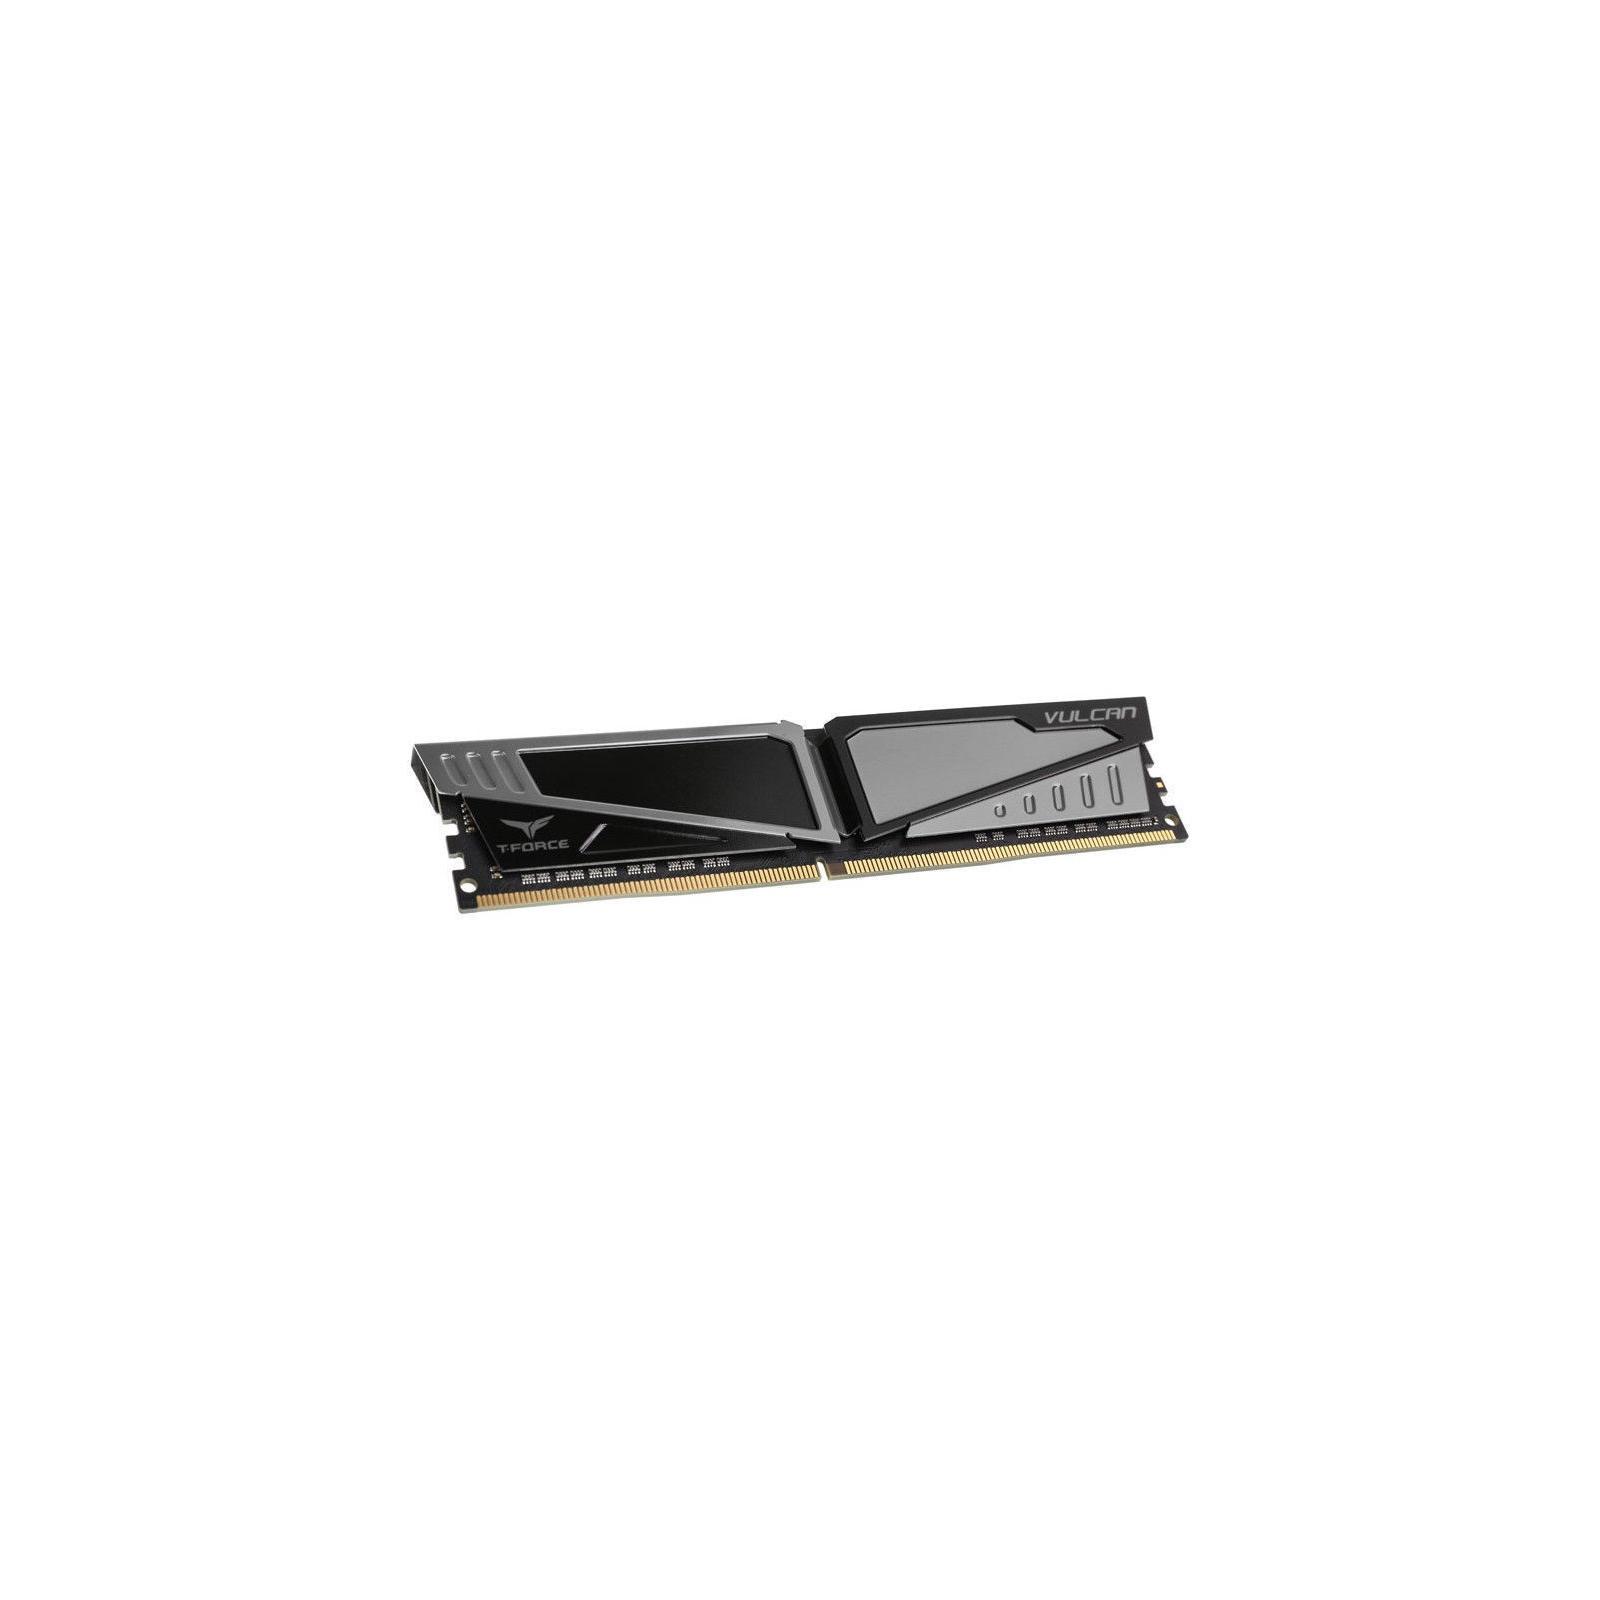 Модуль памяти для компьютера DDR4 8GB 2666 MHz T-Force Vulcan Gray Team (TLGD48G2666HC15B01) изображение 2